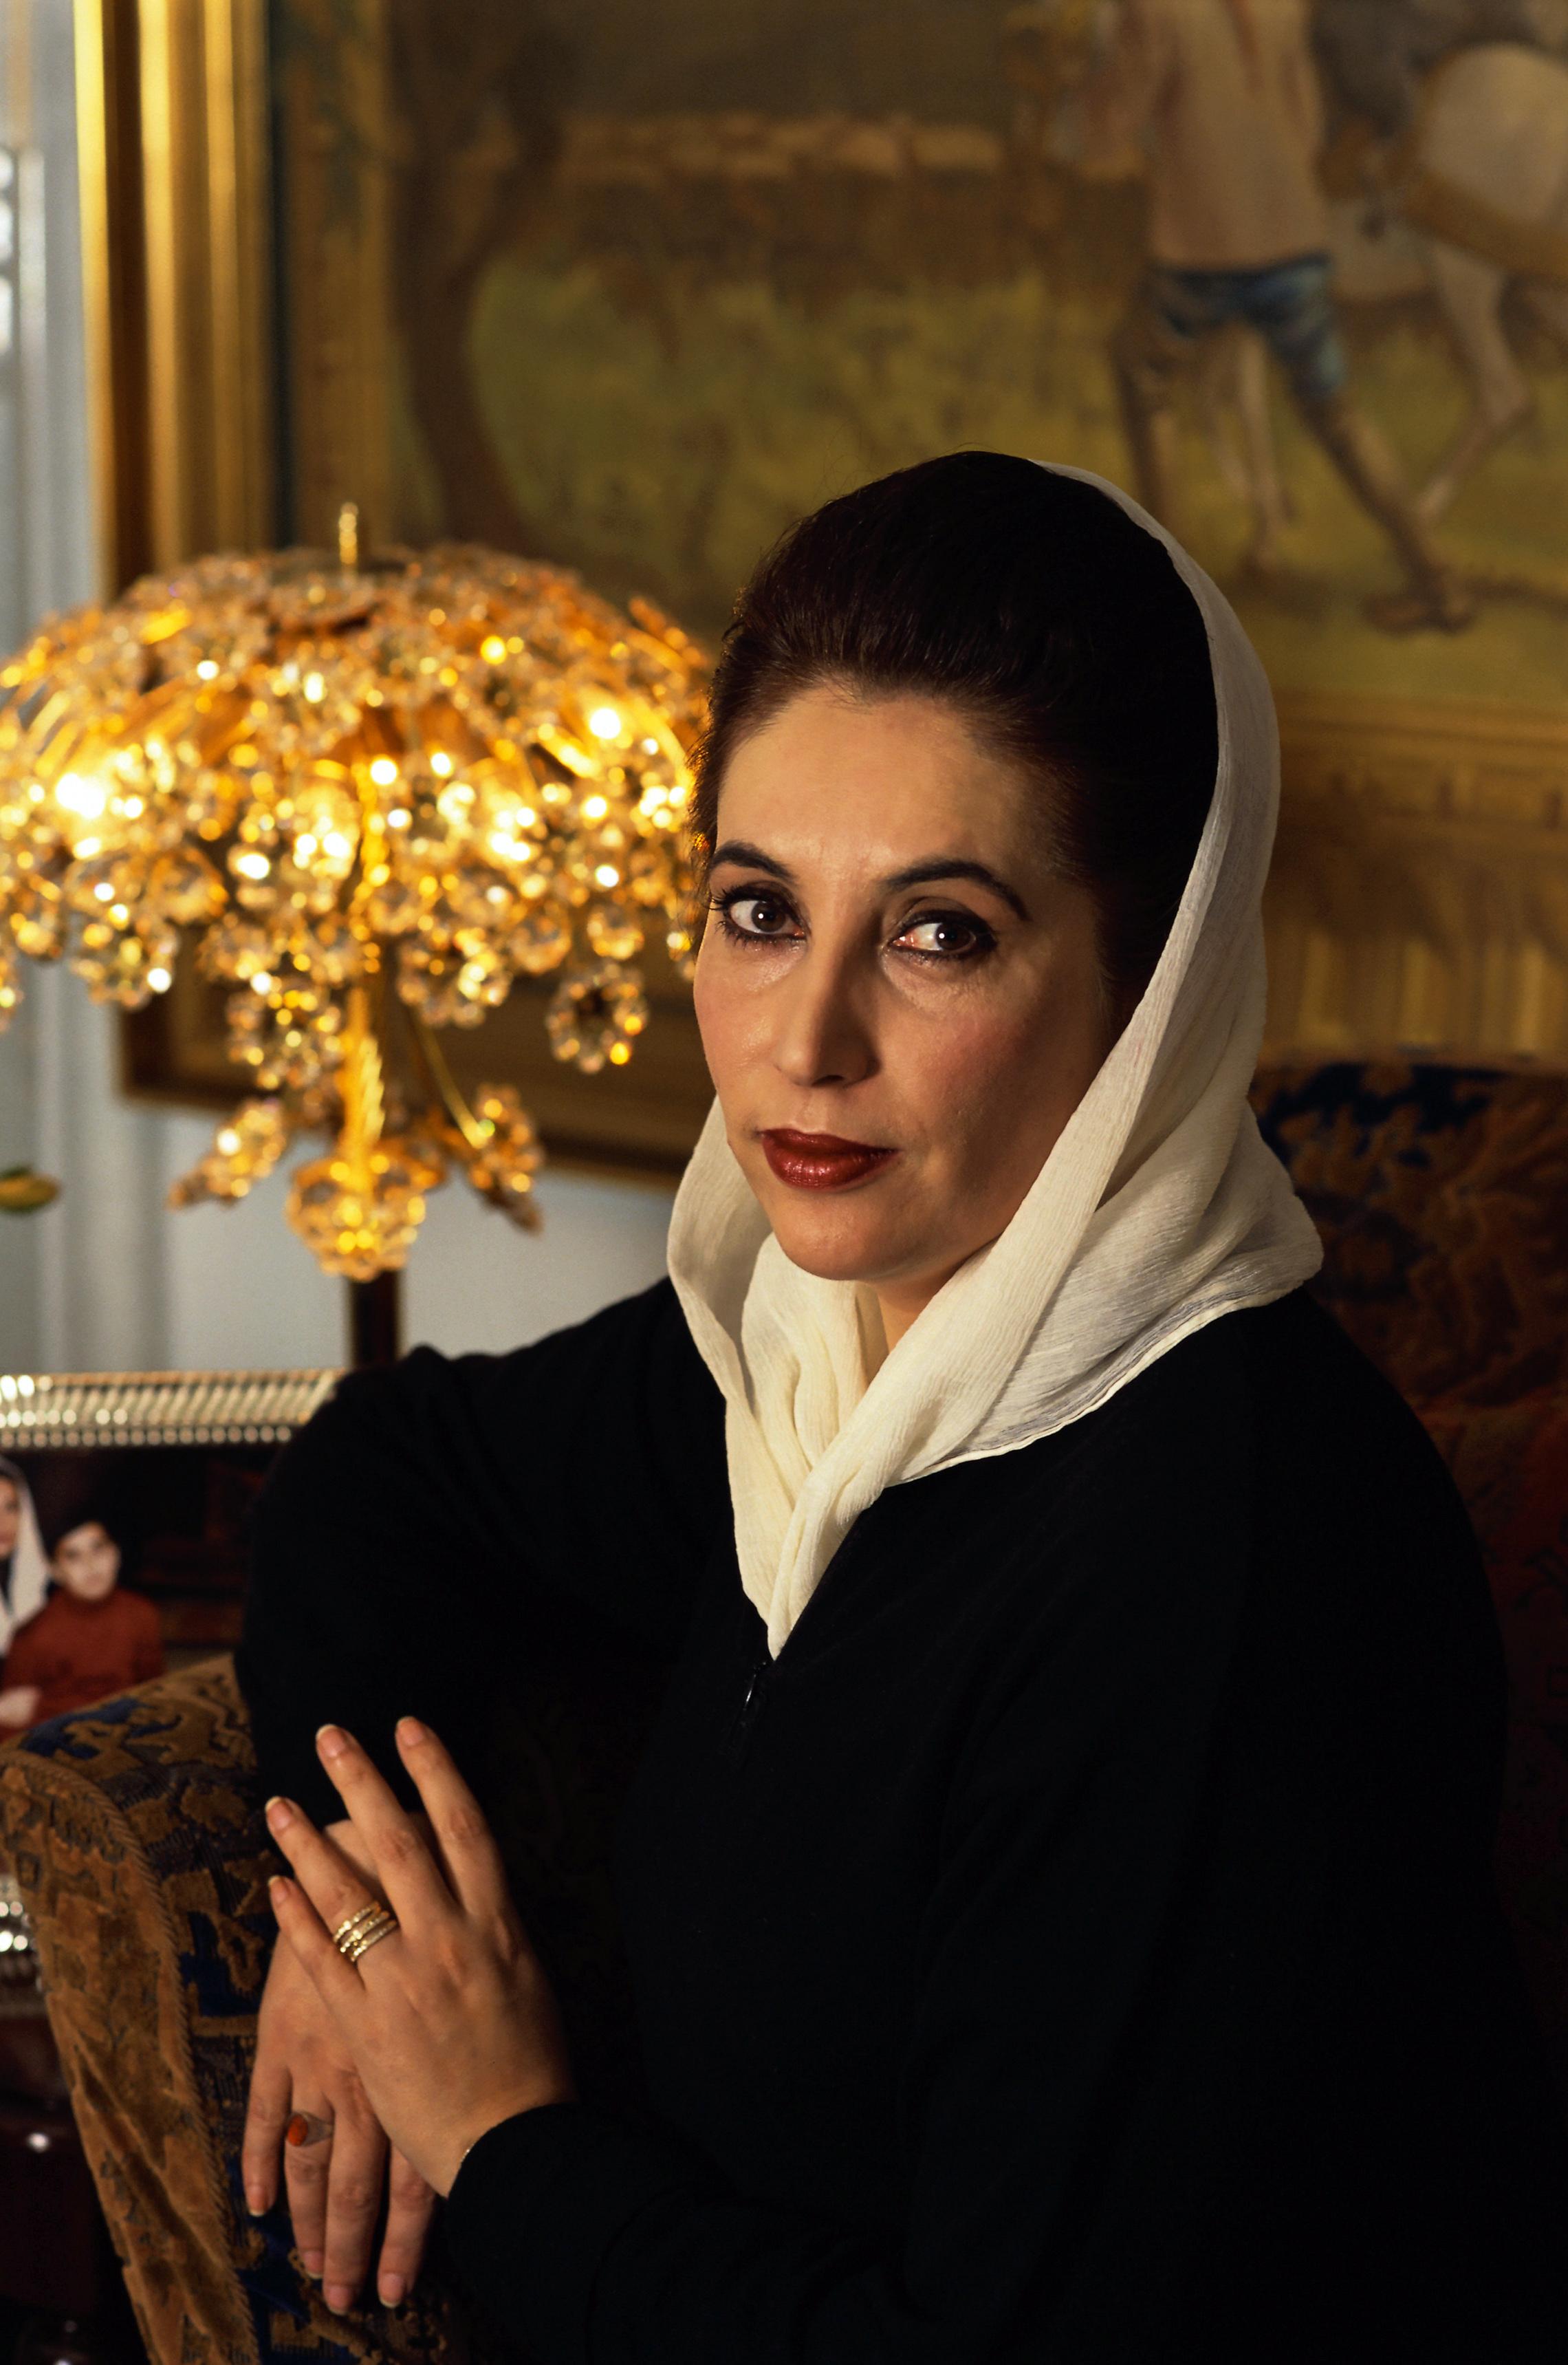 Image of Benazir Bhutto